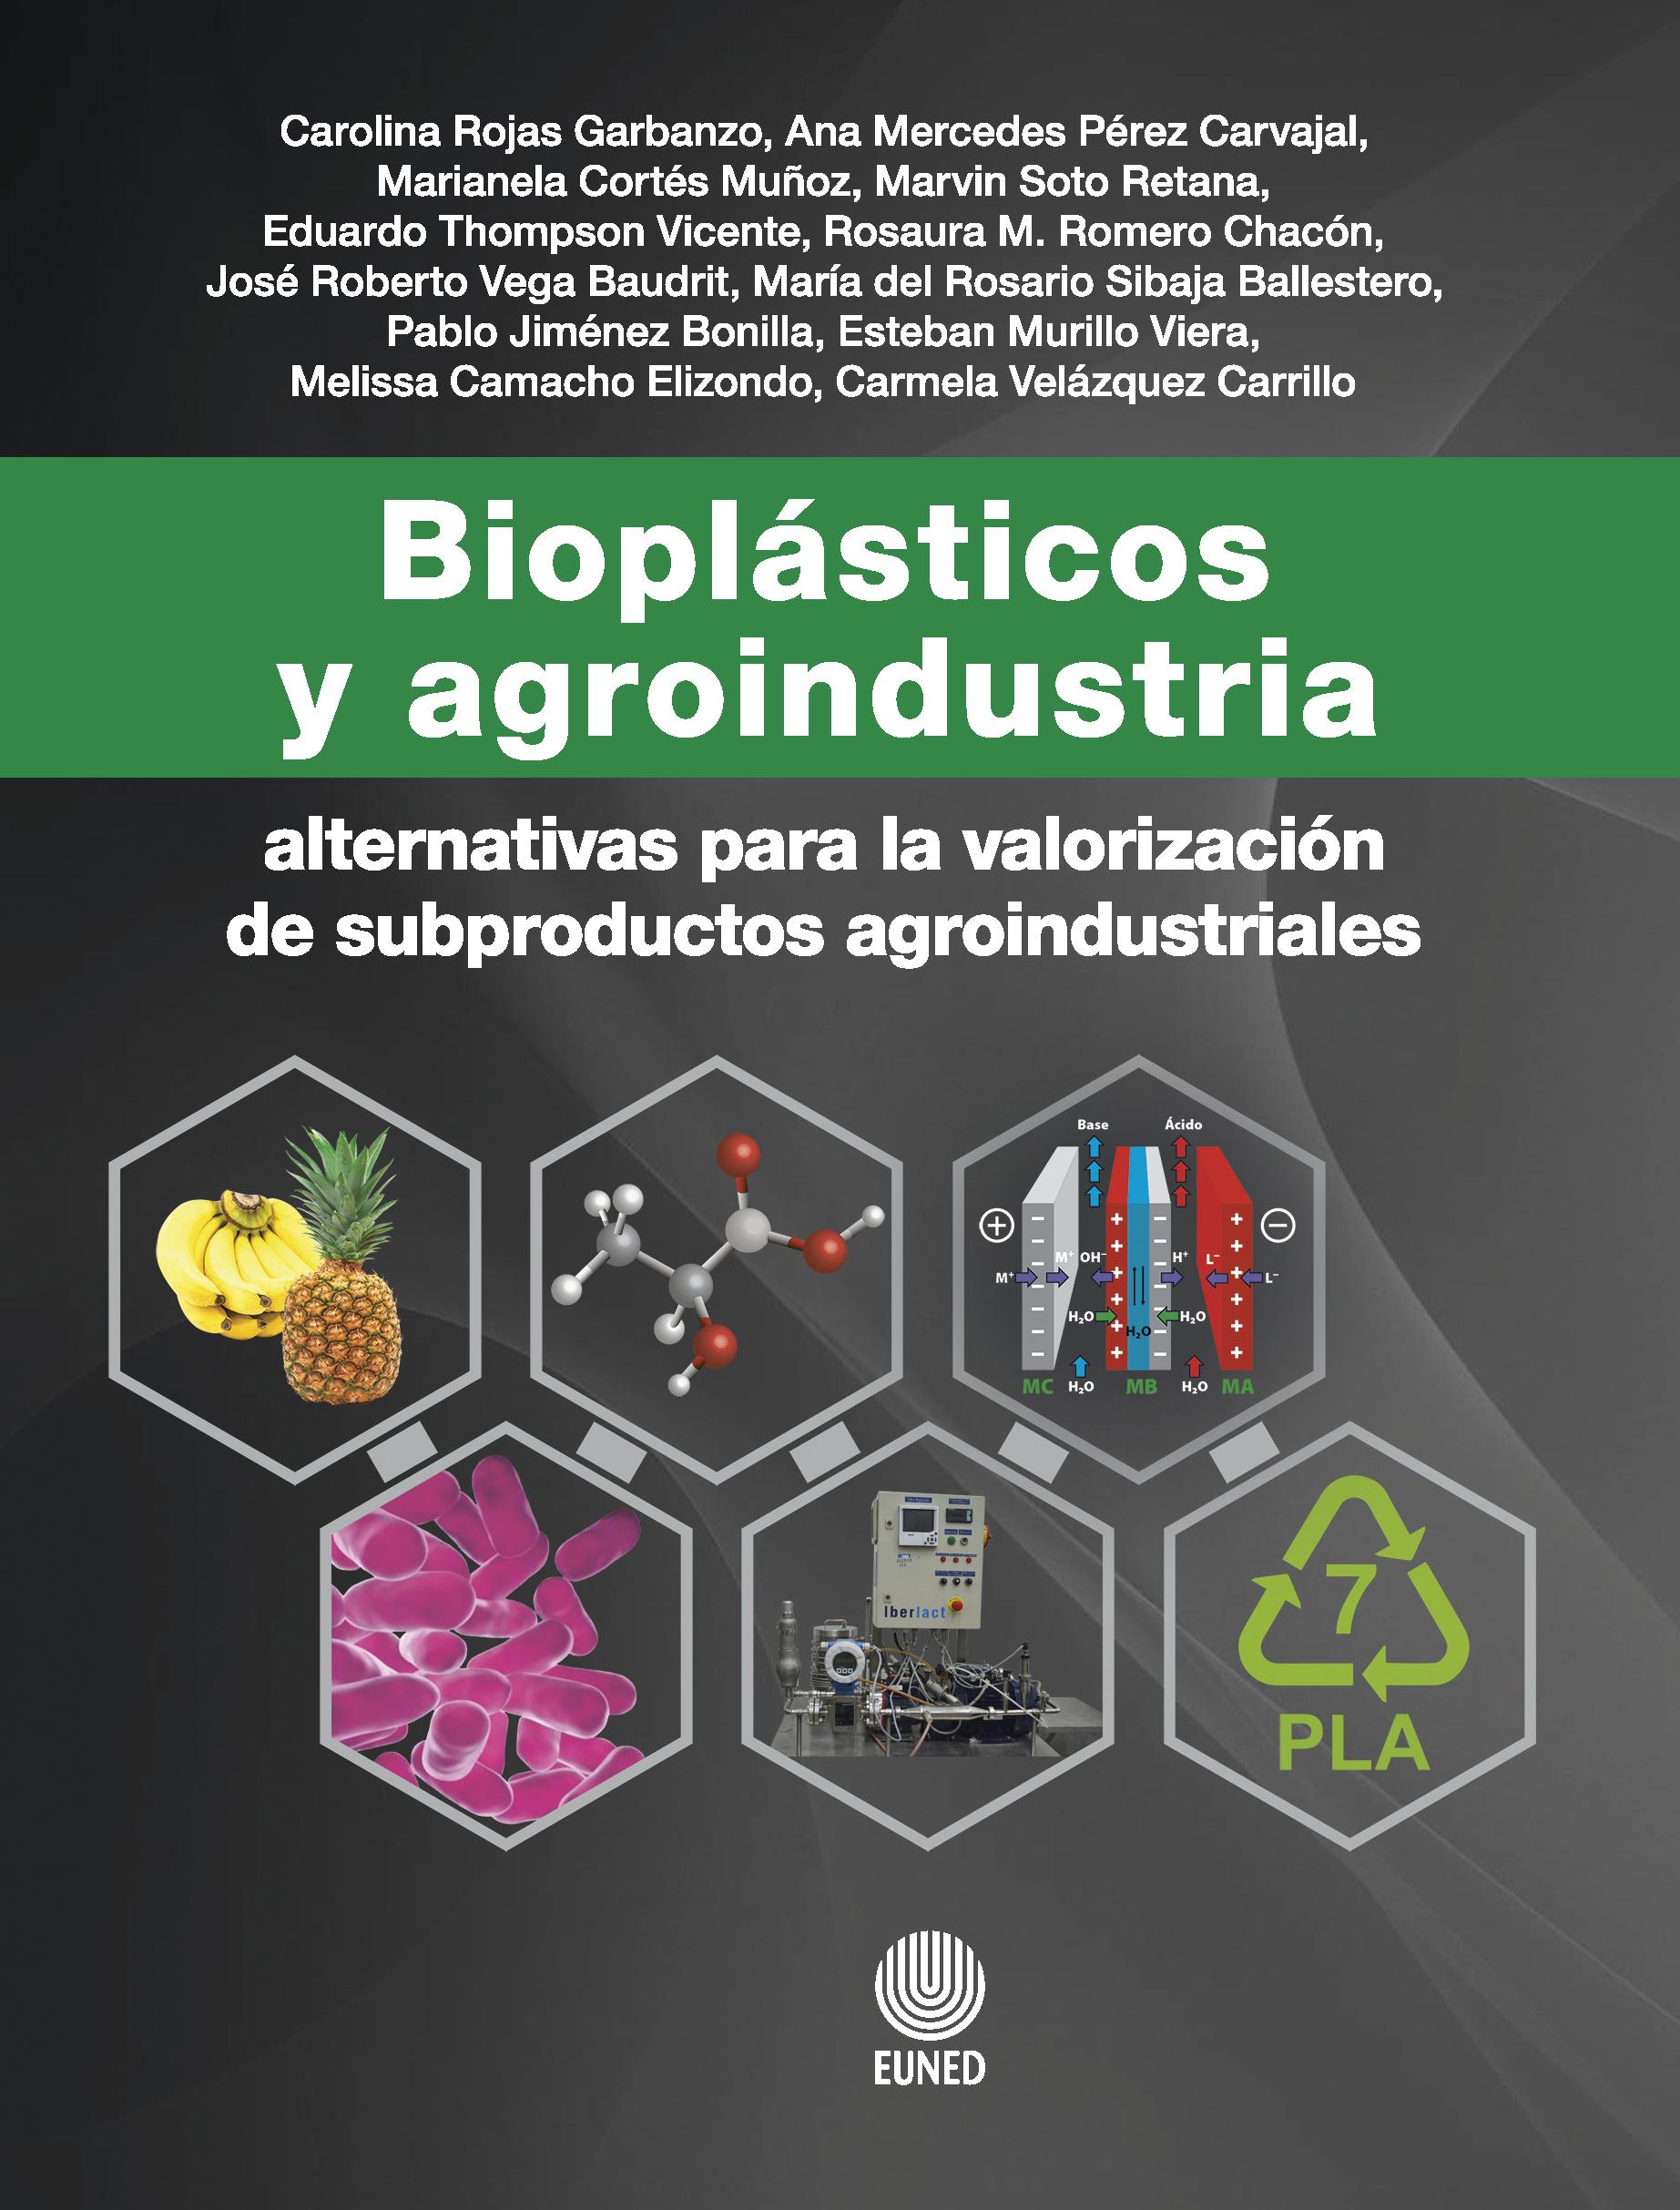 Bioplásticos y agroindustria